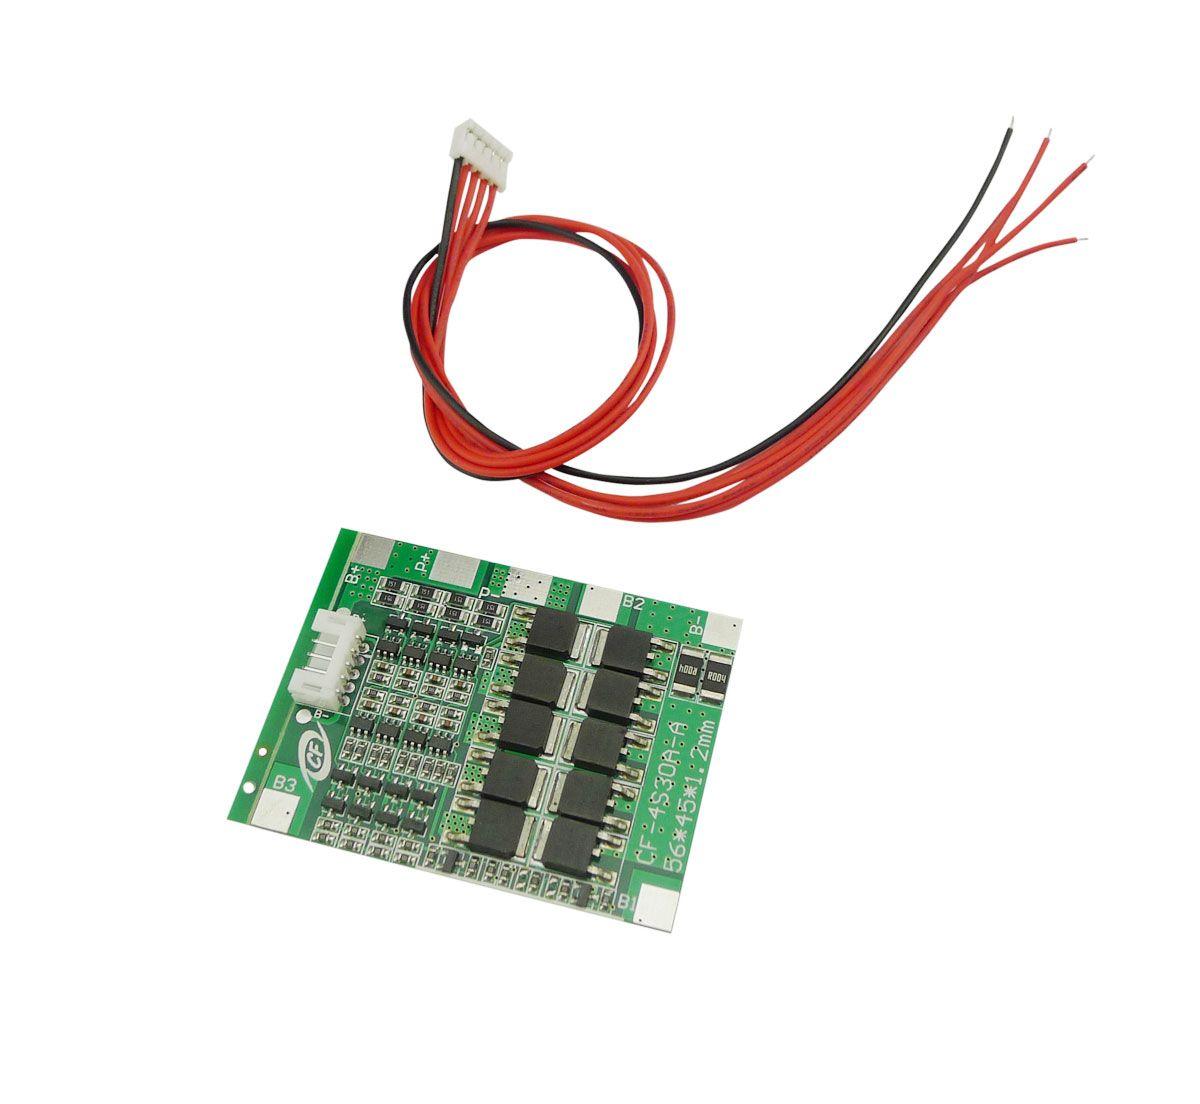 Aihasd 4 s 30A 12 v Lithium-Eisen Phosphat Lifepo4/LFP Batterie BMS Packs PCB Power Schutz Bord